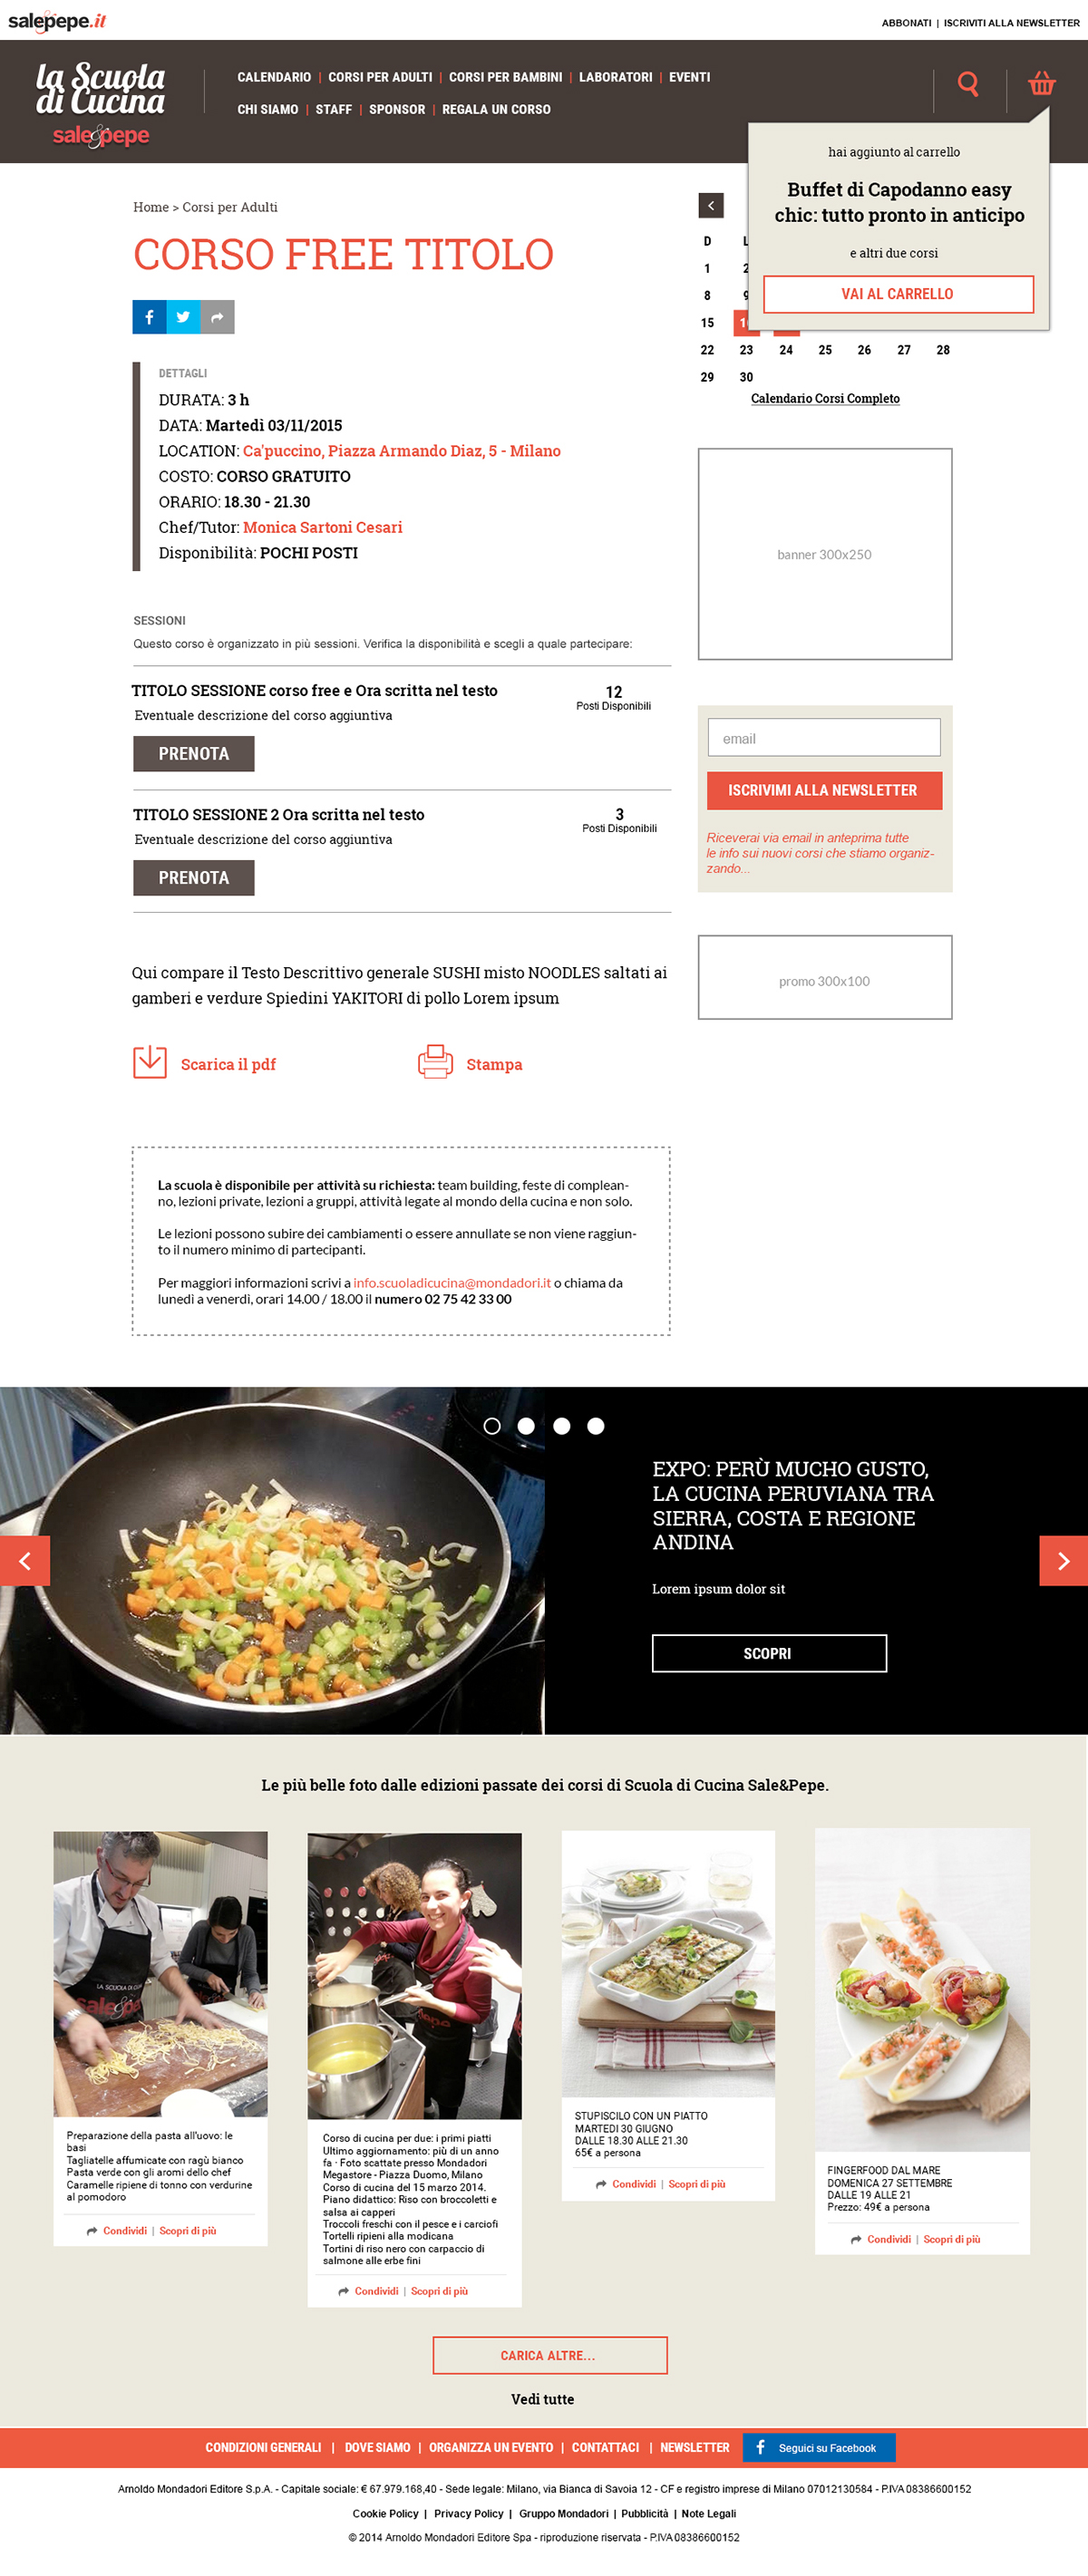 scuola di cucina sale&pepe cooking school e-commerce Website Responsive Food